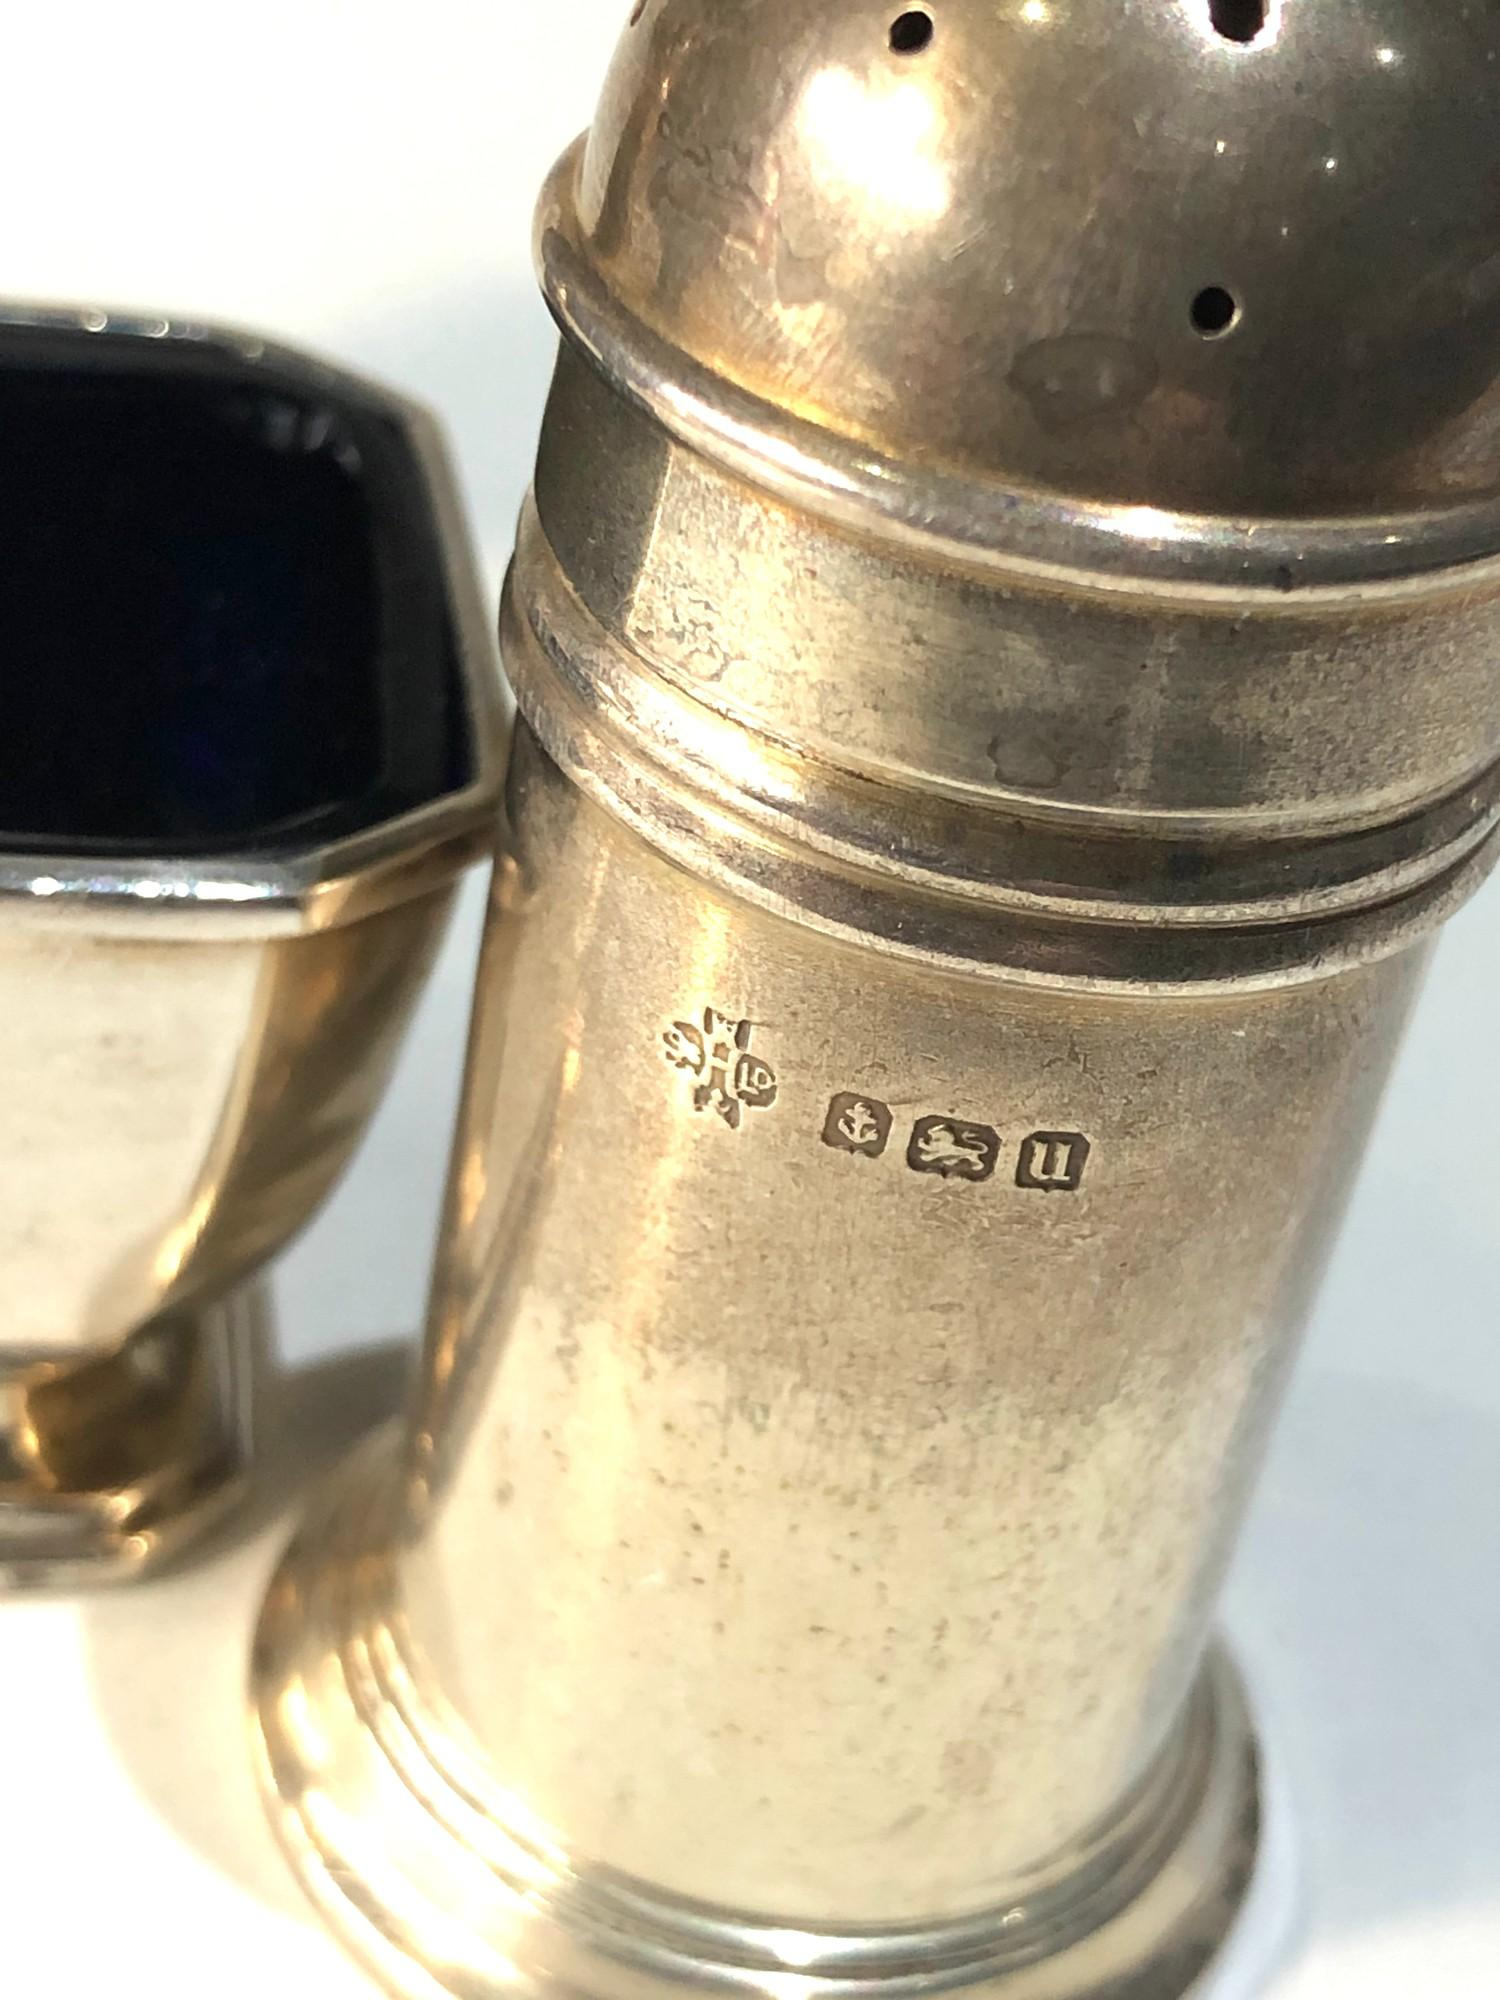 Silver cruet item includes mustard salt and pepper pots - Image 4 of 5